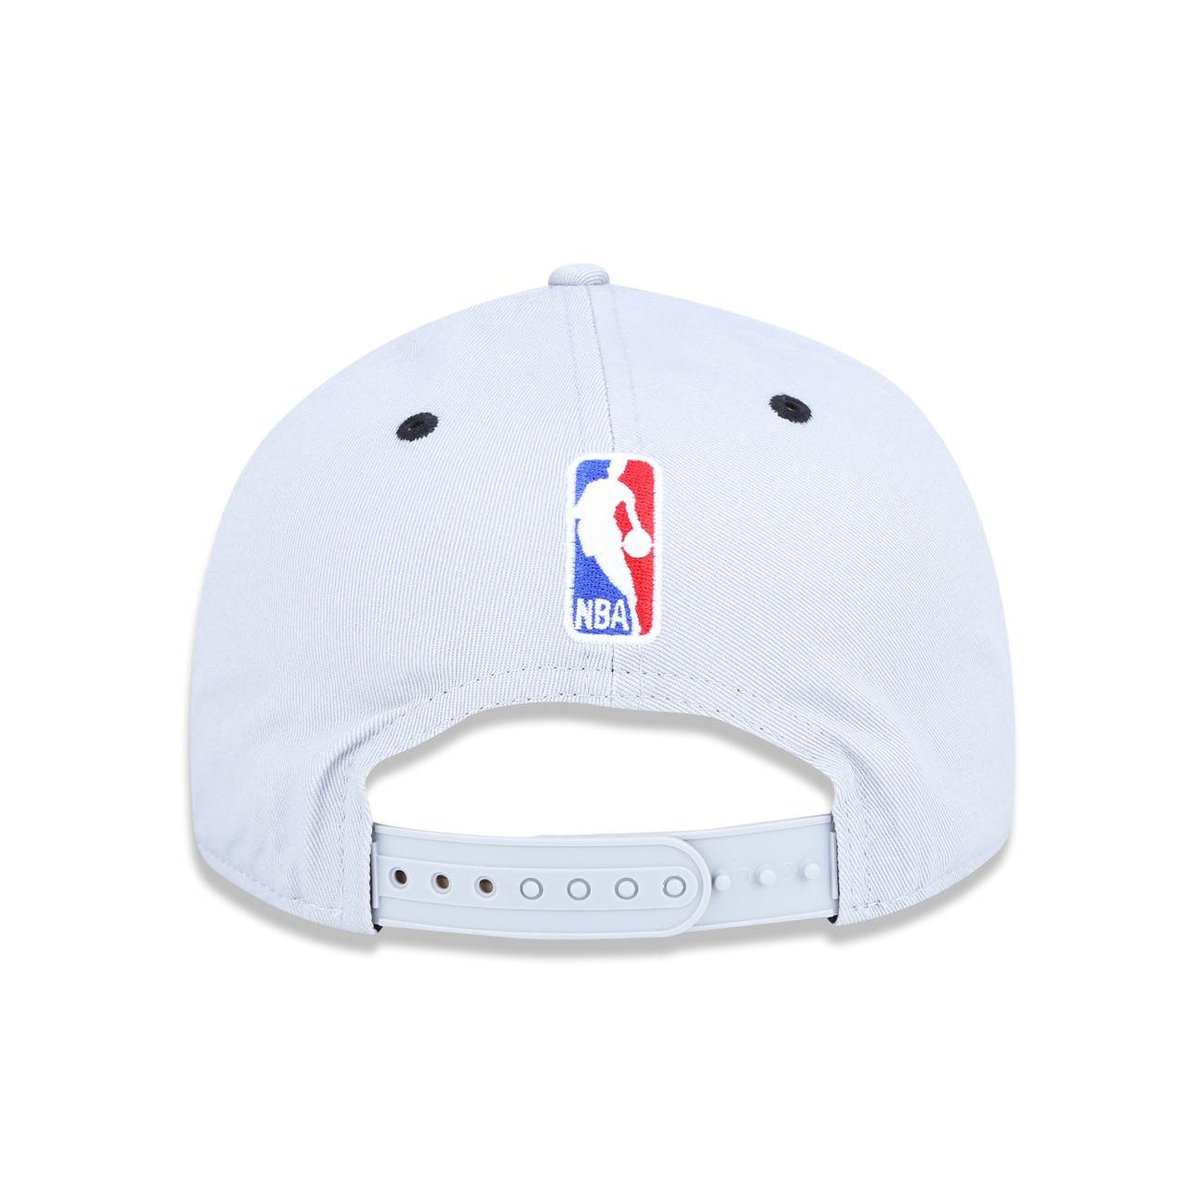 ... Boné 950 Original Fit San Antonio Spurs NBA Aba Reta Snapback New Era  ... 187e040e3f7